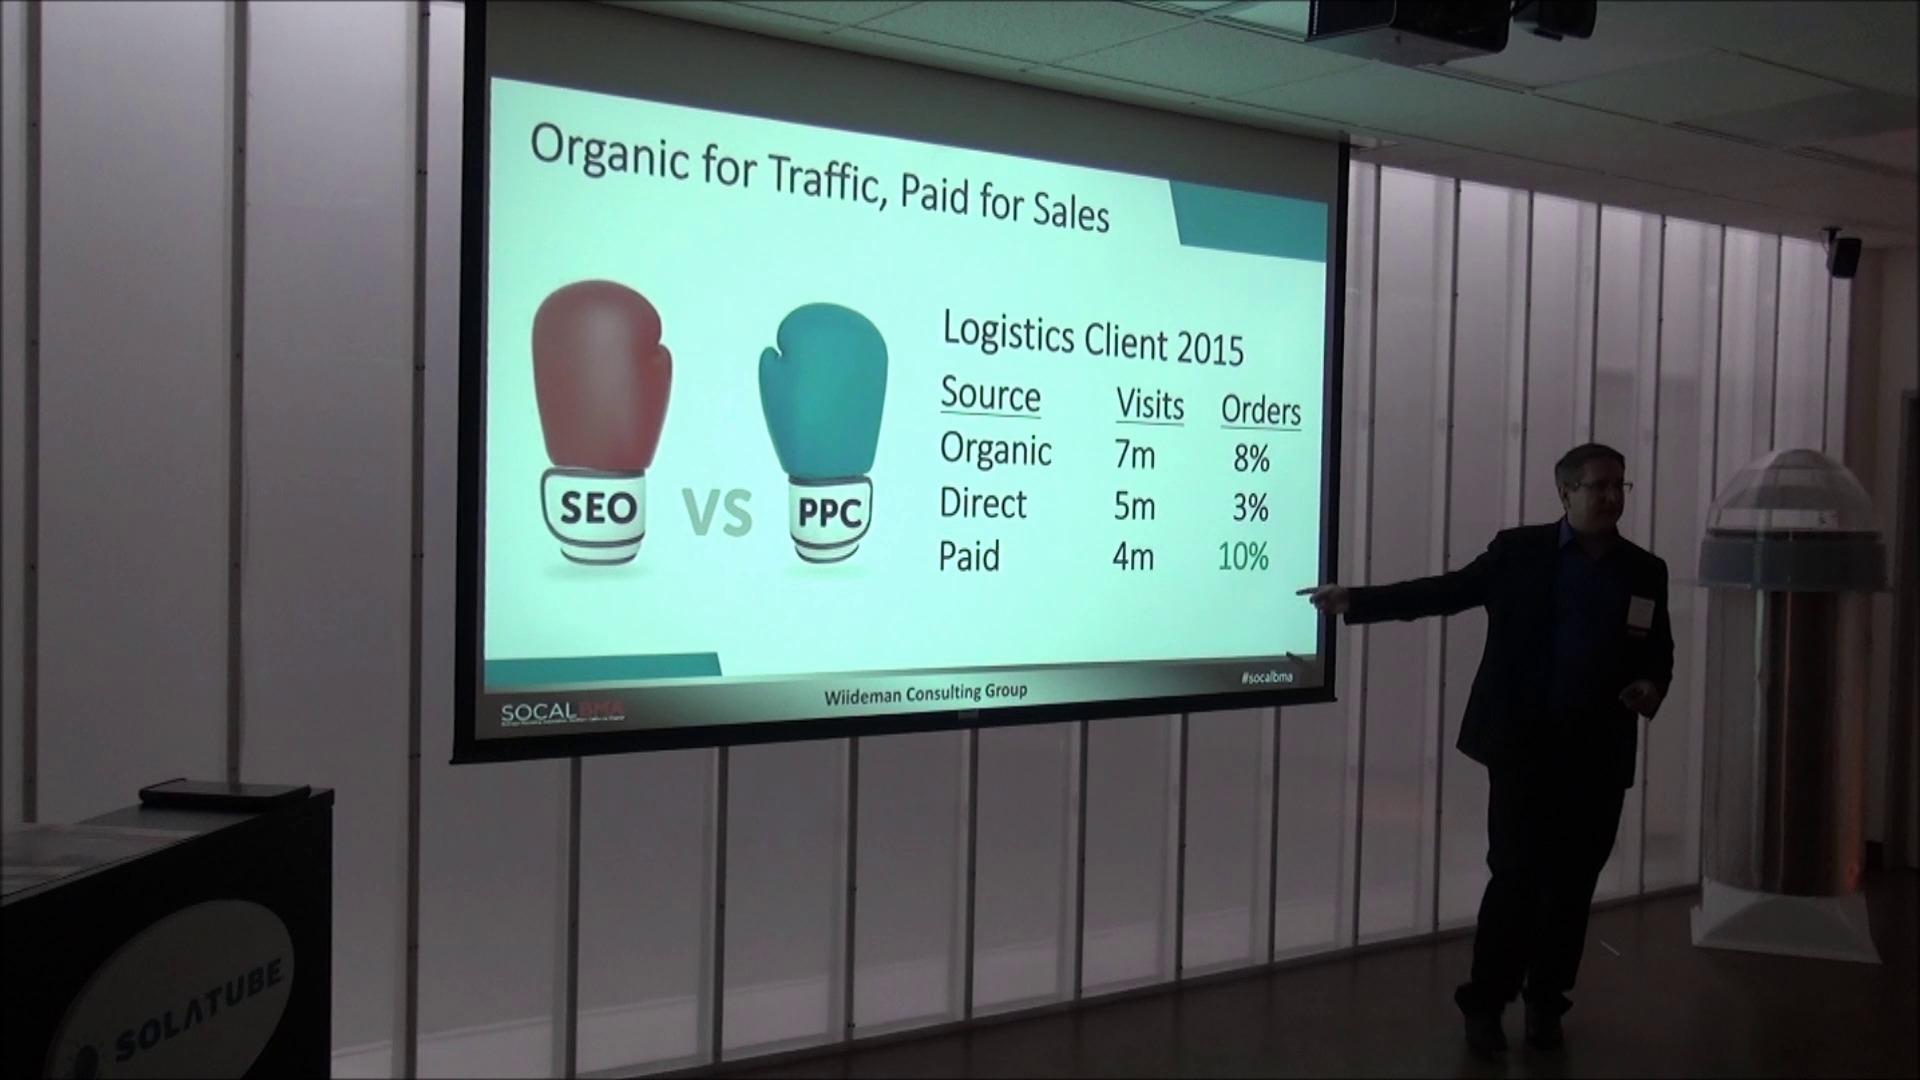 SEO Speaker Steve Wiideman - Tech, Content & Off-Page Topic Presenter